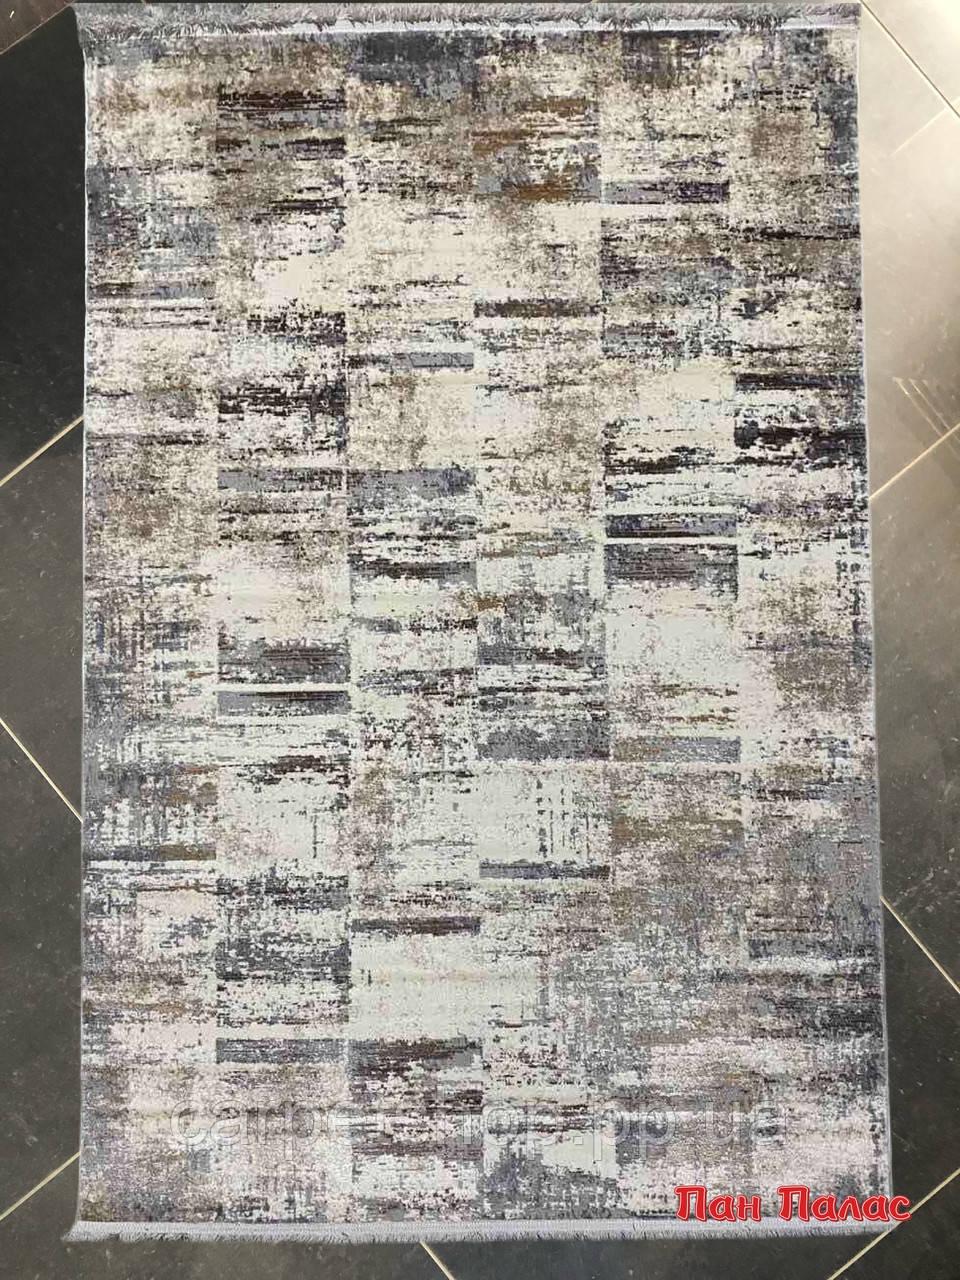 2х3 м. PERI New Rubin carpet- ковер на пол, высота ворса 9 мм. Прямоугольные и овалы!